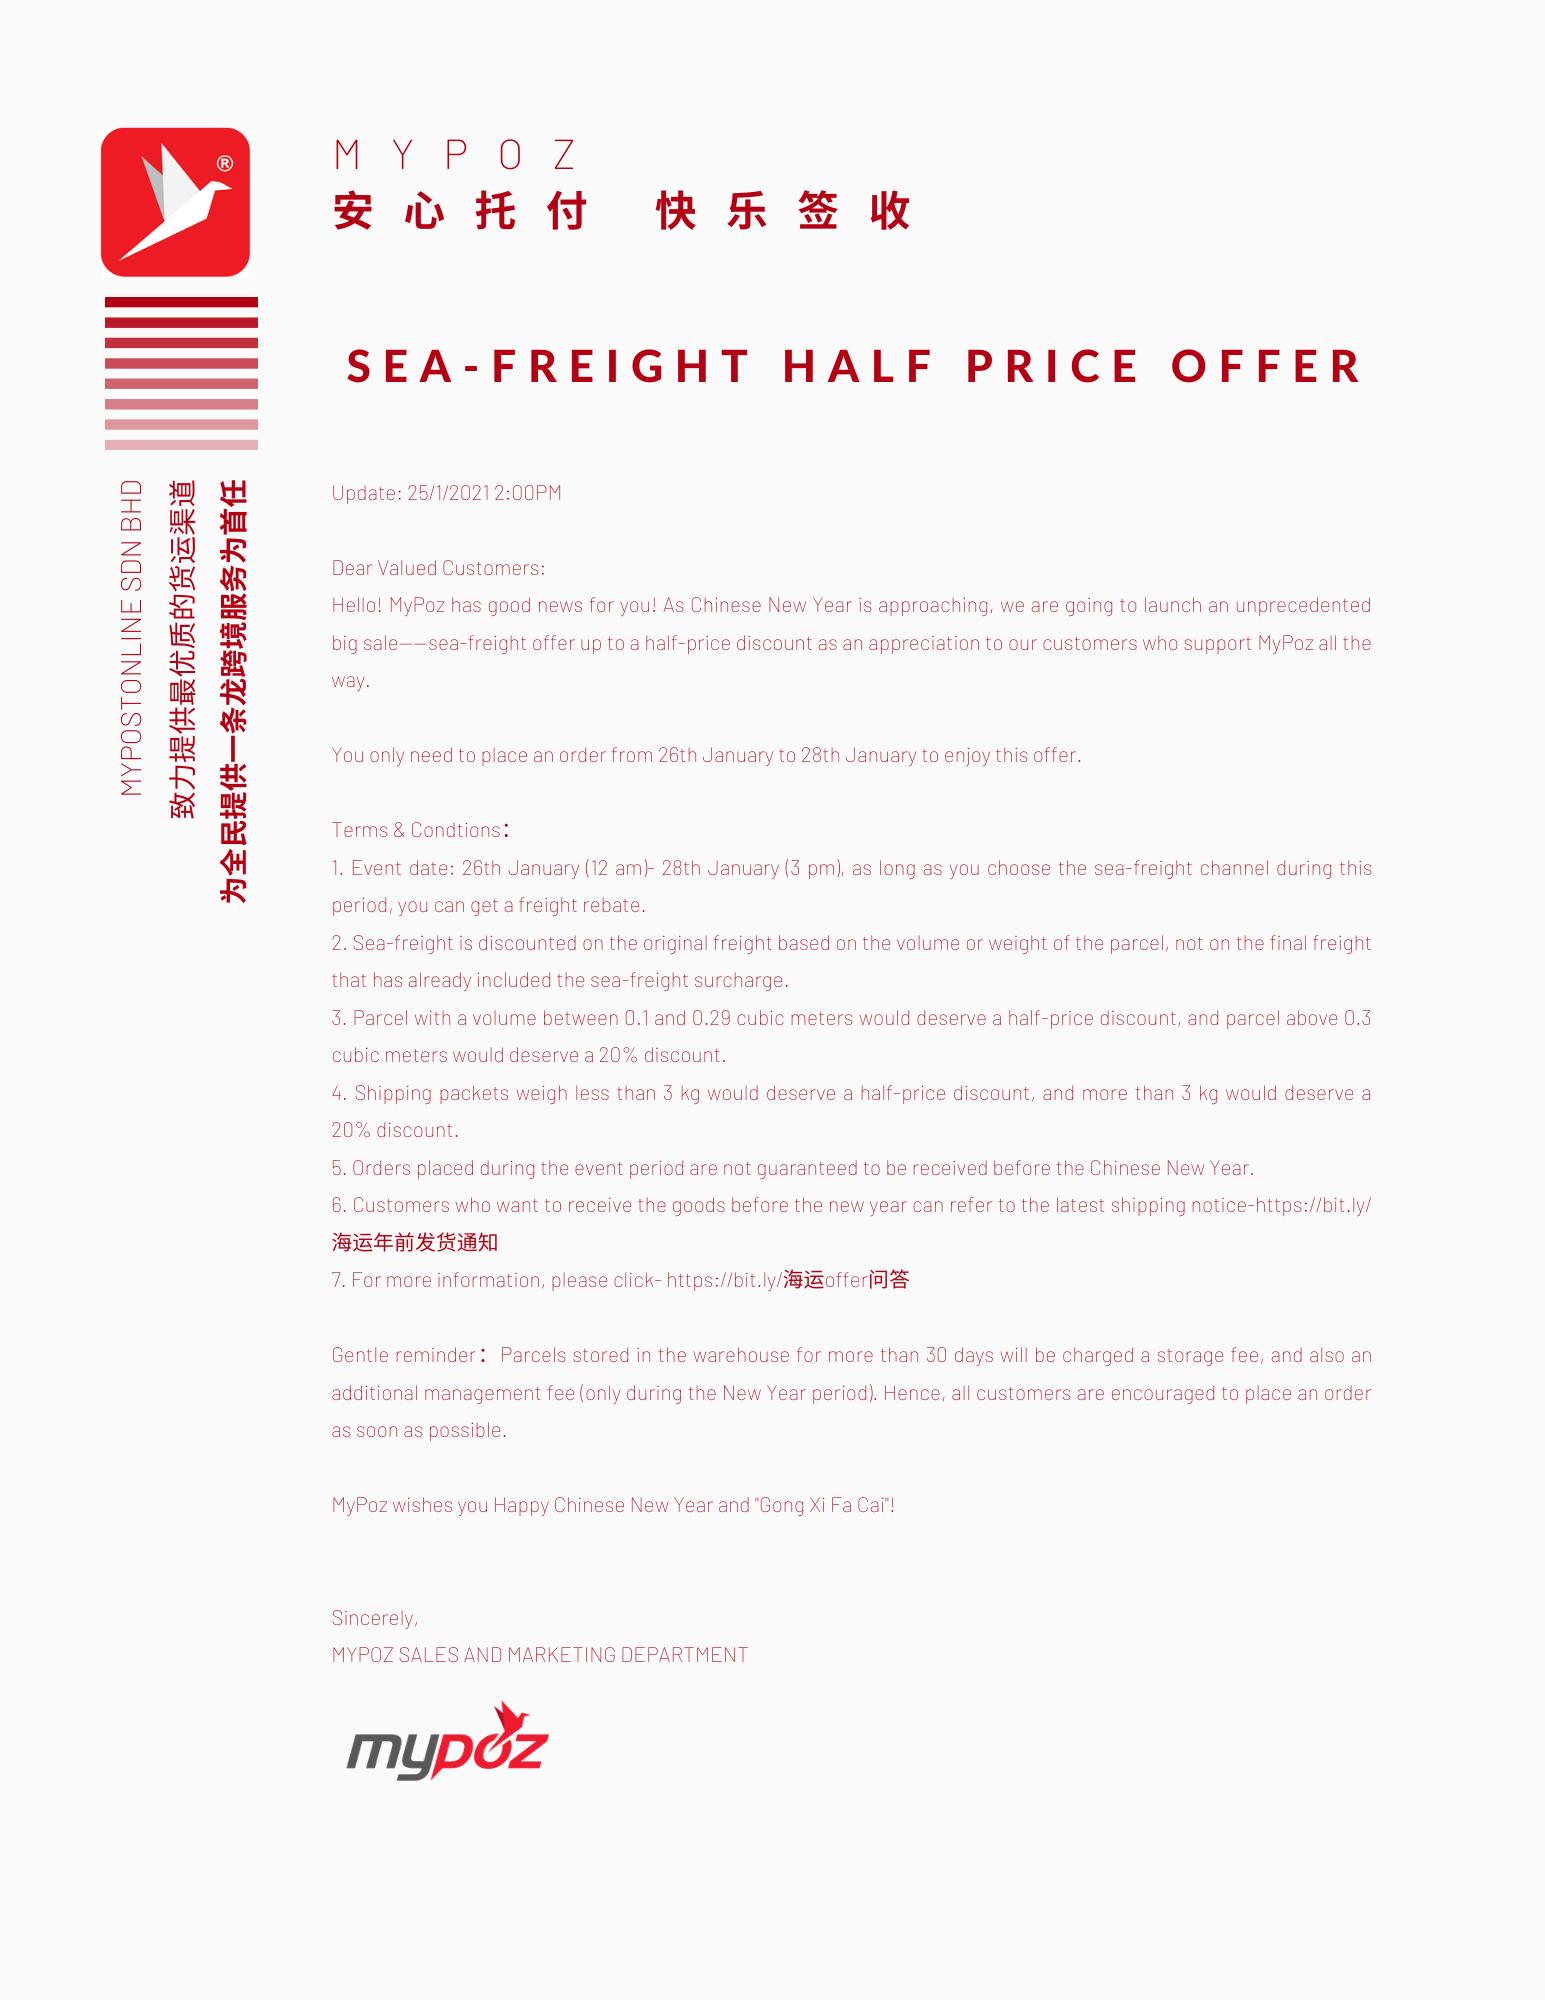 【NOTICE】SEA-FREIGHT HALF PRICE OFFER